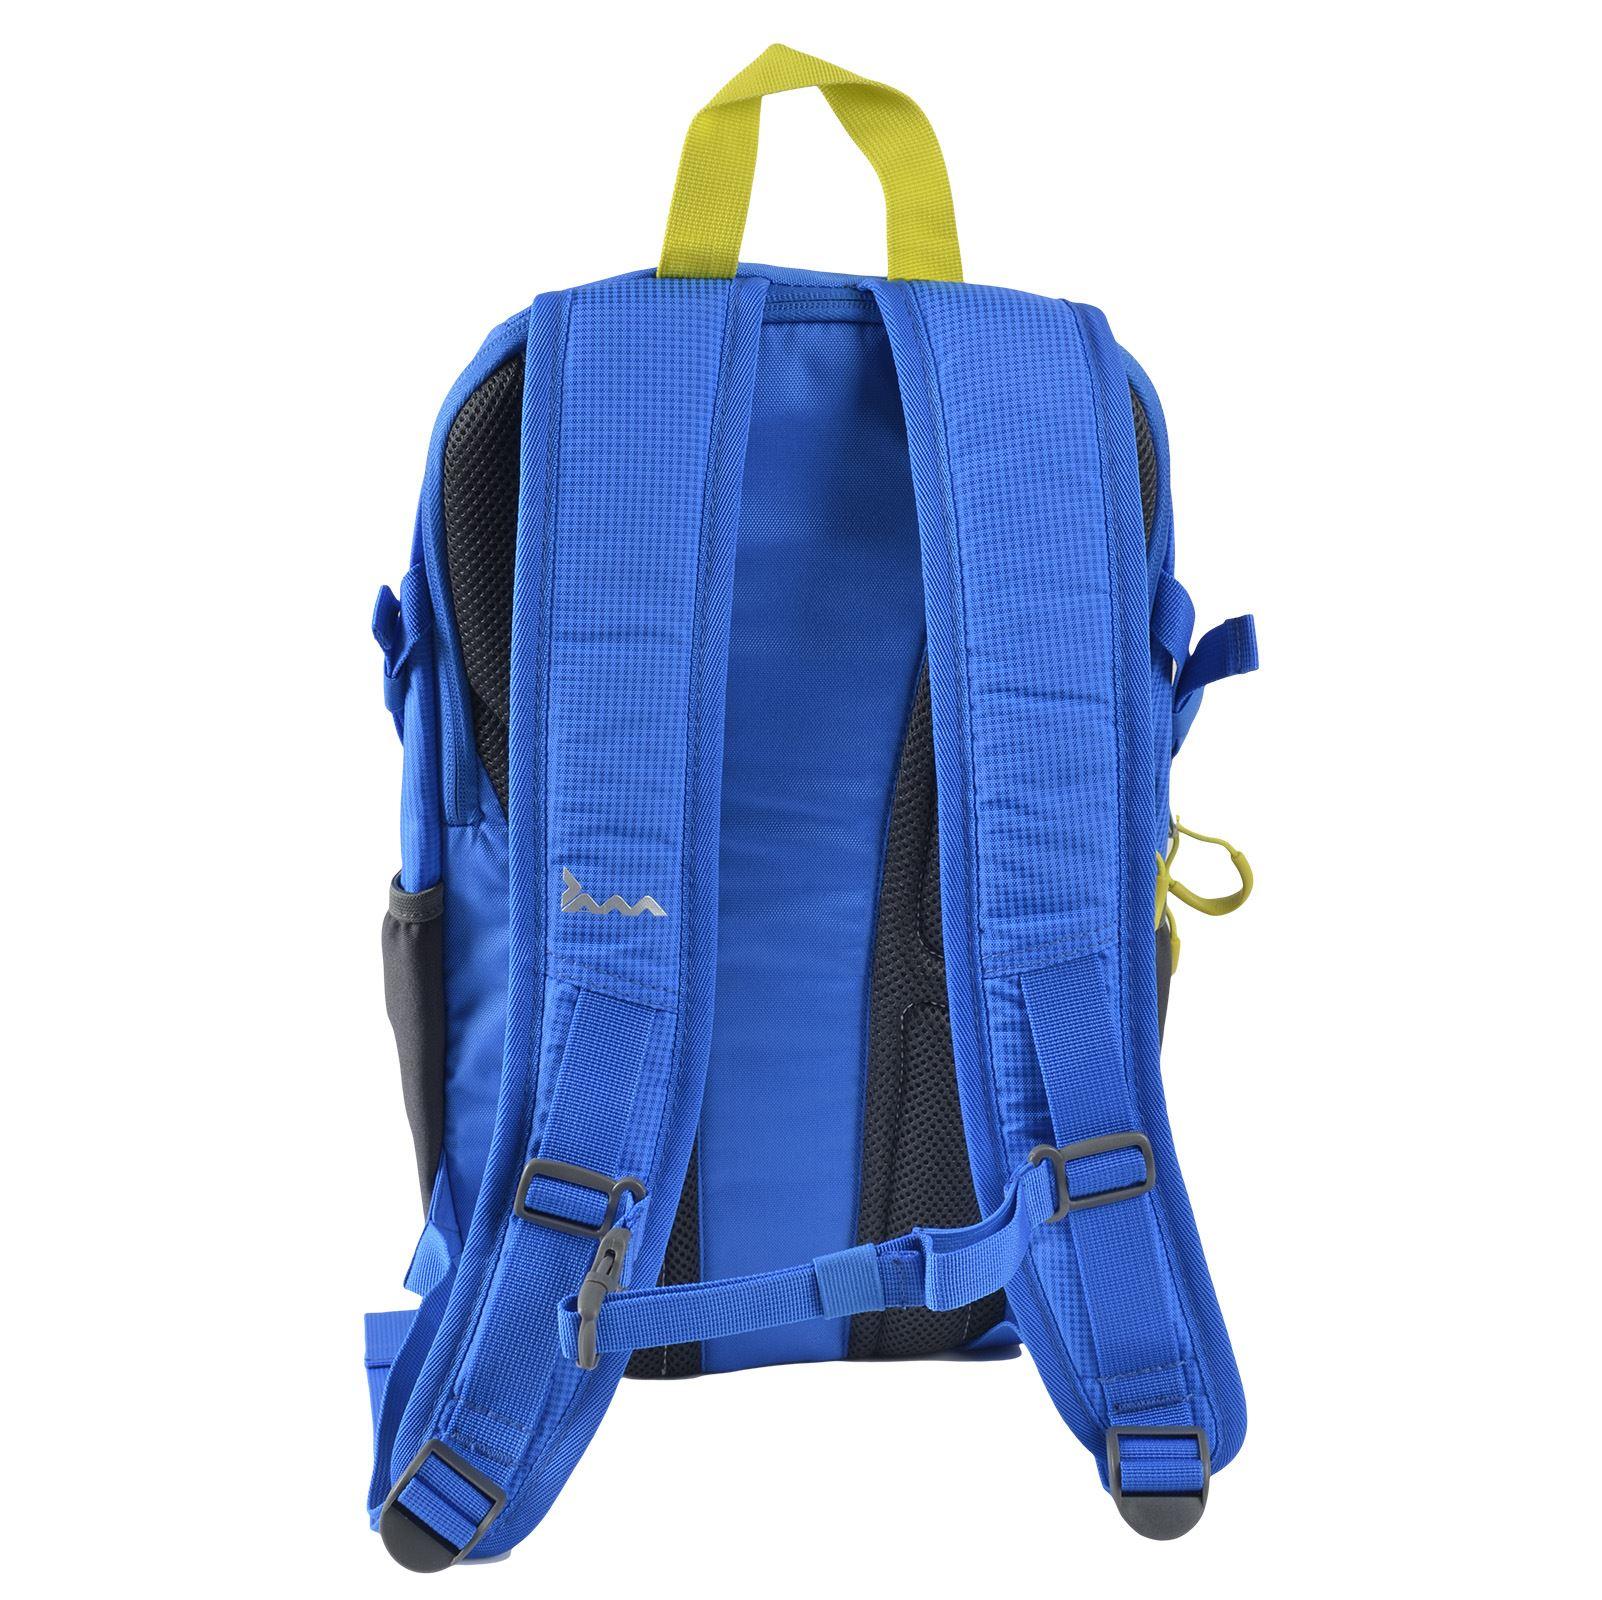 JAM Trek Backpack Rucksack Daysack Waterproof Lightweight Walking Hiking 15L 25L